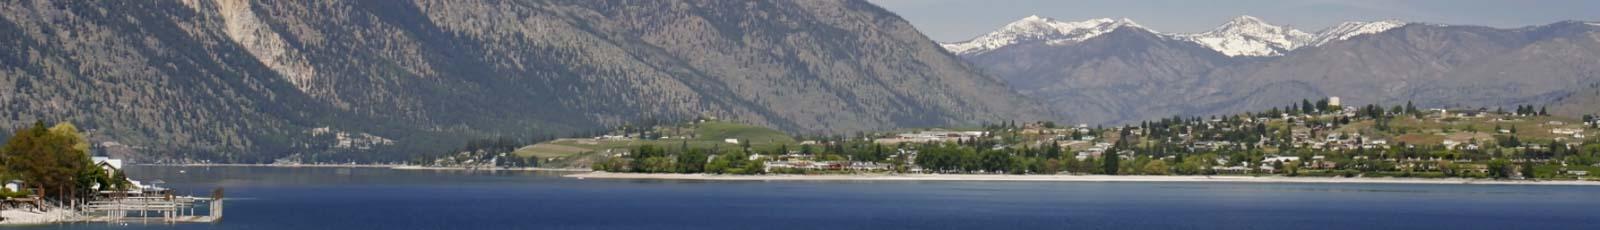 Chelan County Waterfront Market Statistics